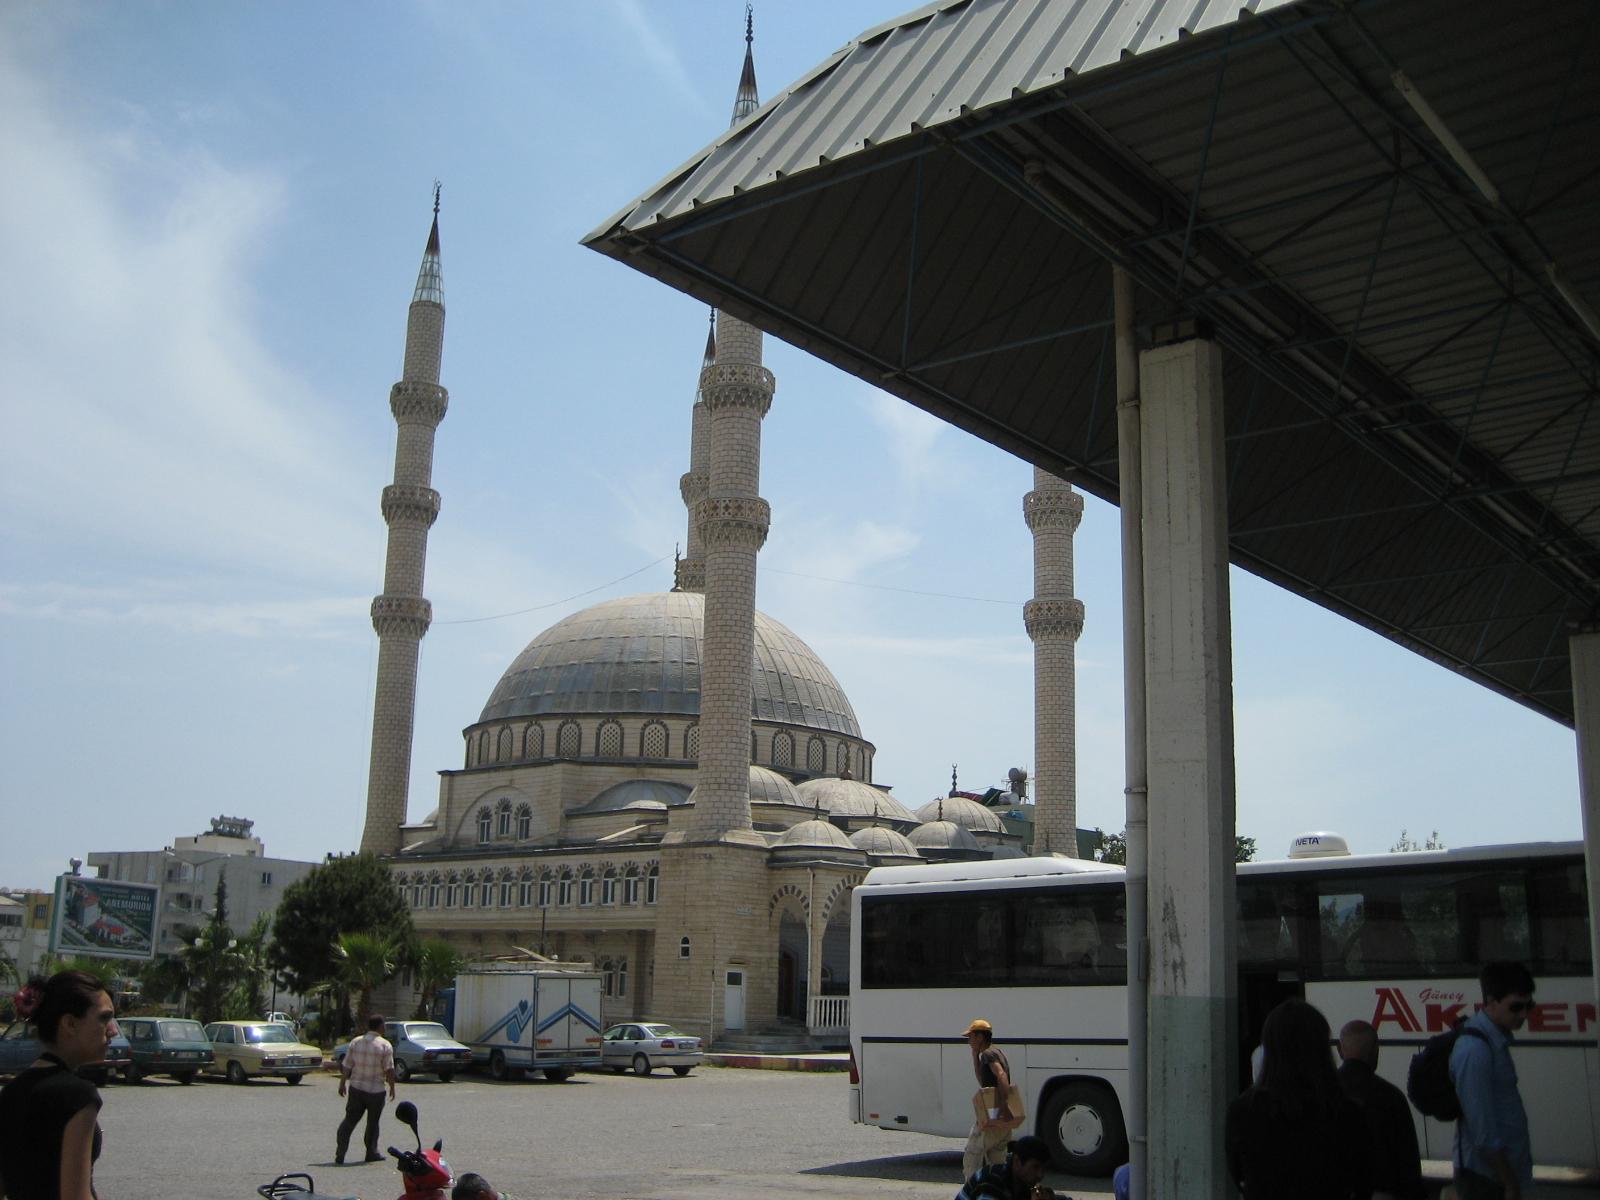 Turkish bus stations